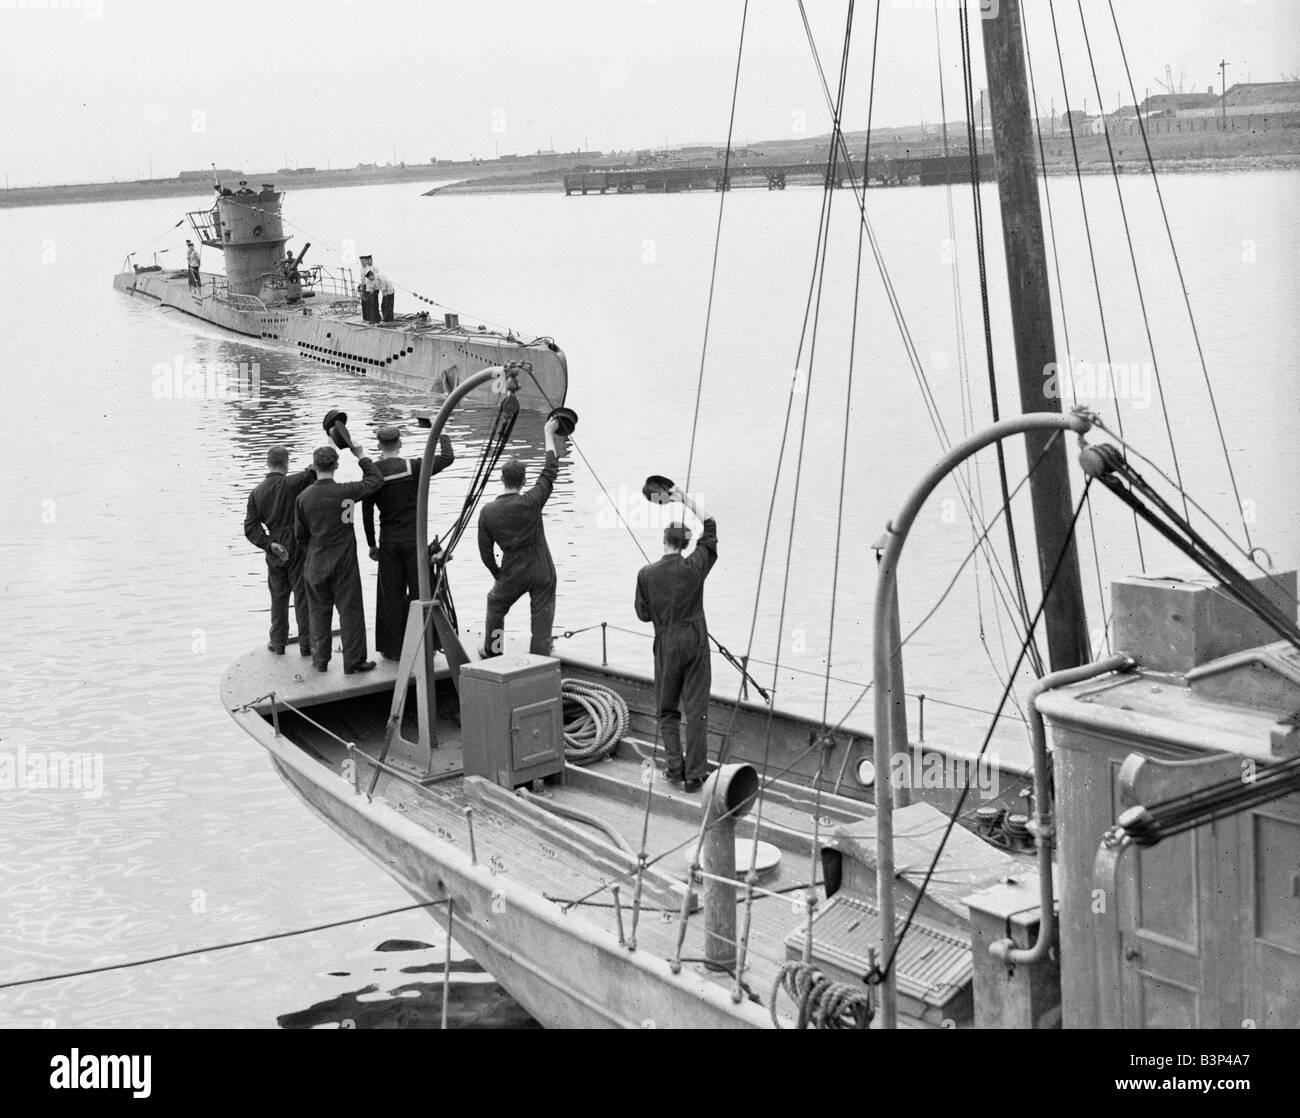 Ww2 German U Boat Submarine First German U Boat To Be